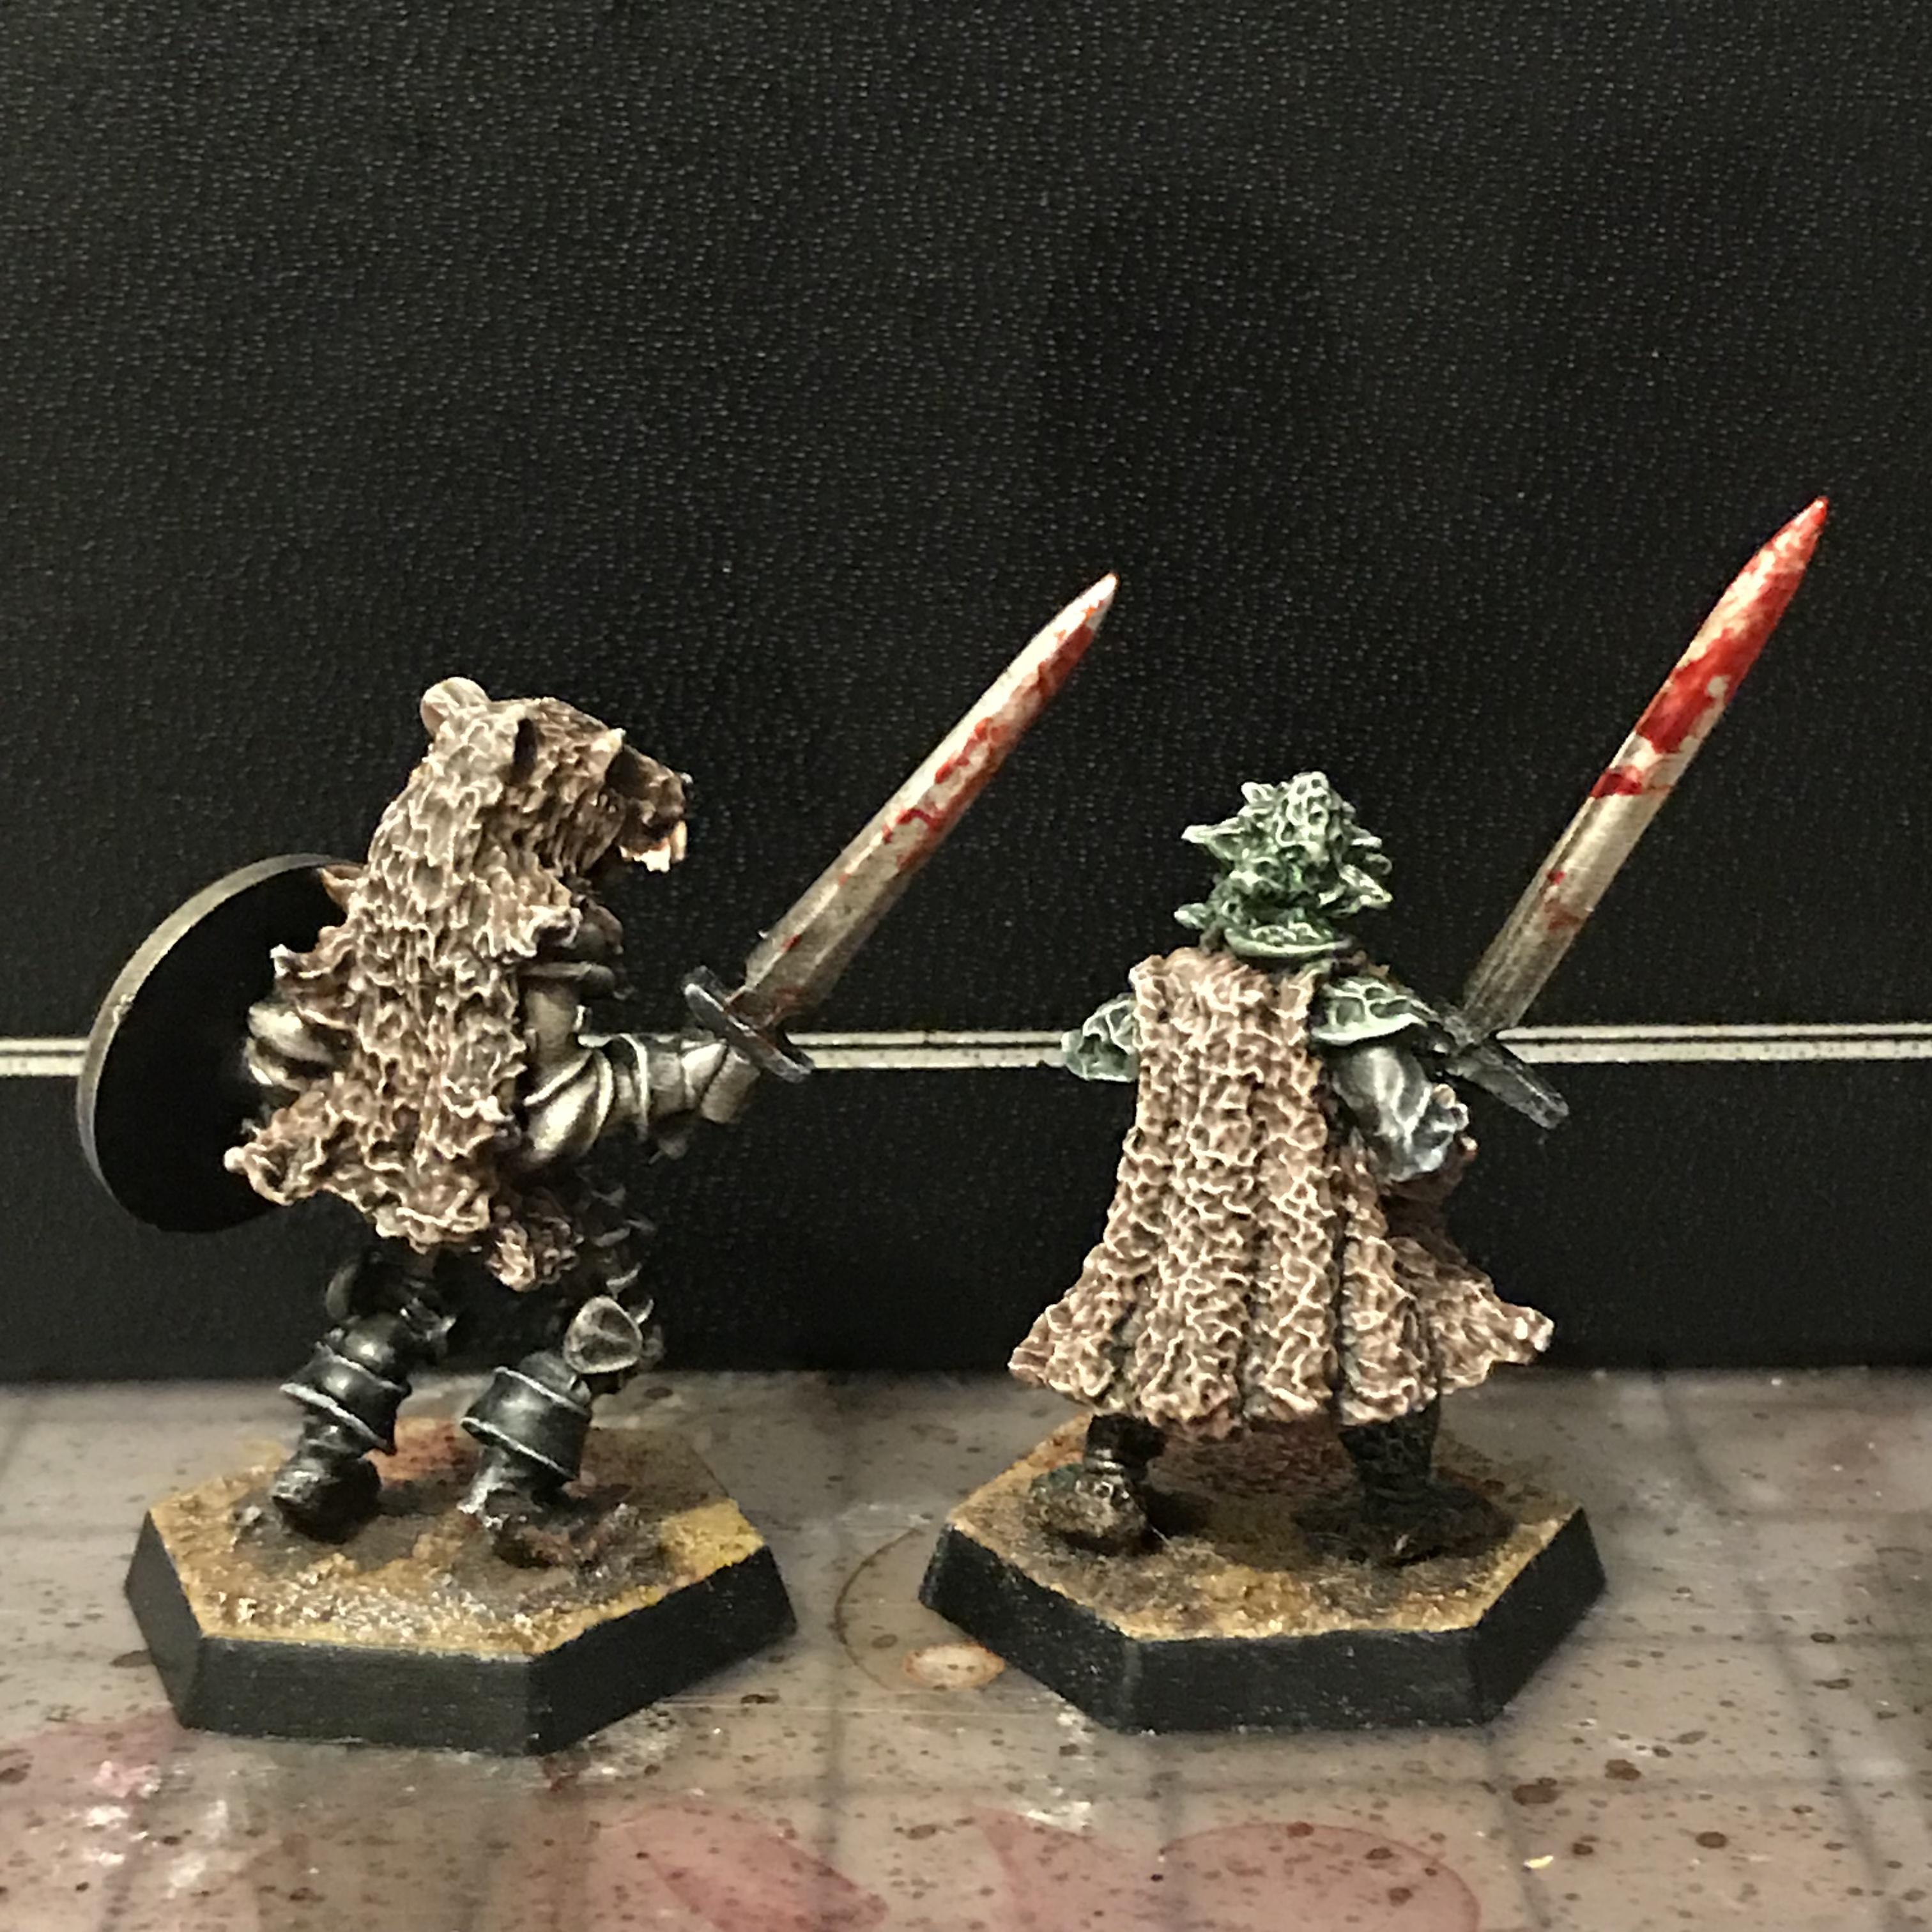 Battle, Champion Citadel, Eternal, Miniatures, Moorcock, Oldhammer, Roleplay, Series, Warhammer Fantasy